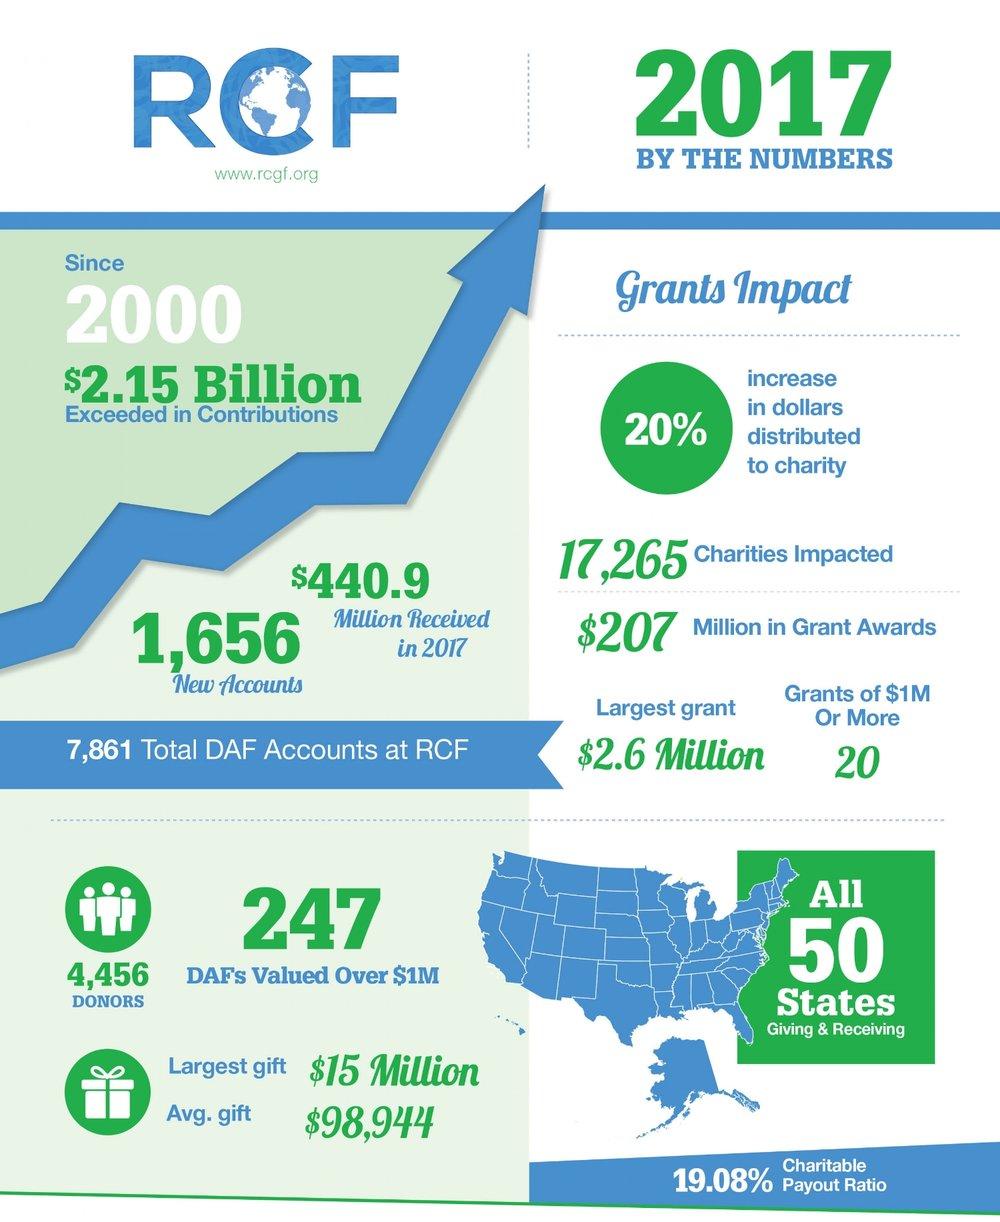 RenPSG_2018_YearEnd_Infographic.jpg